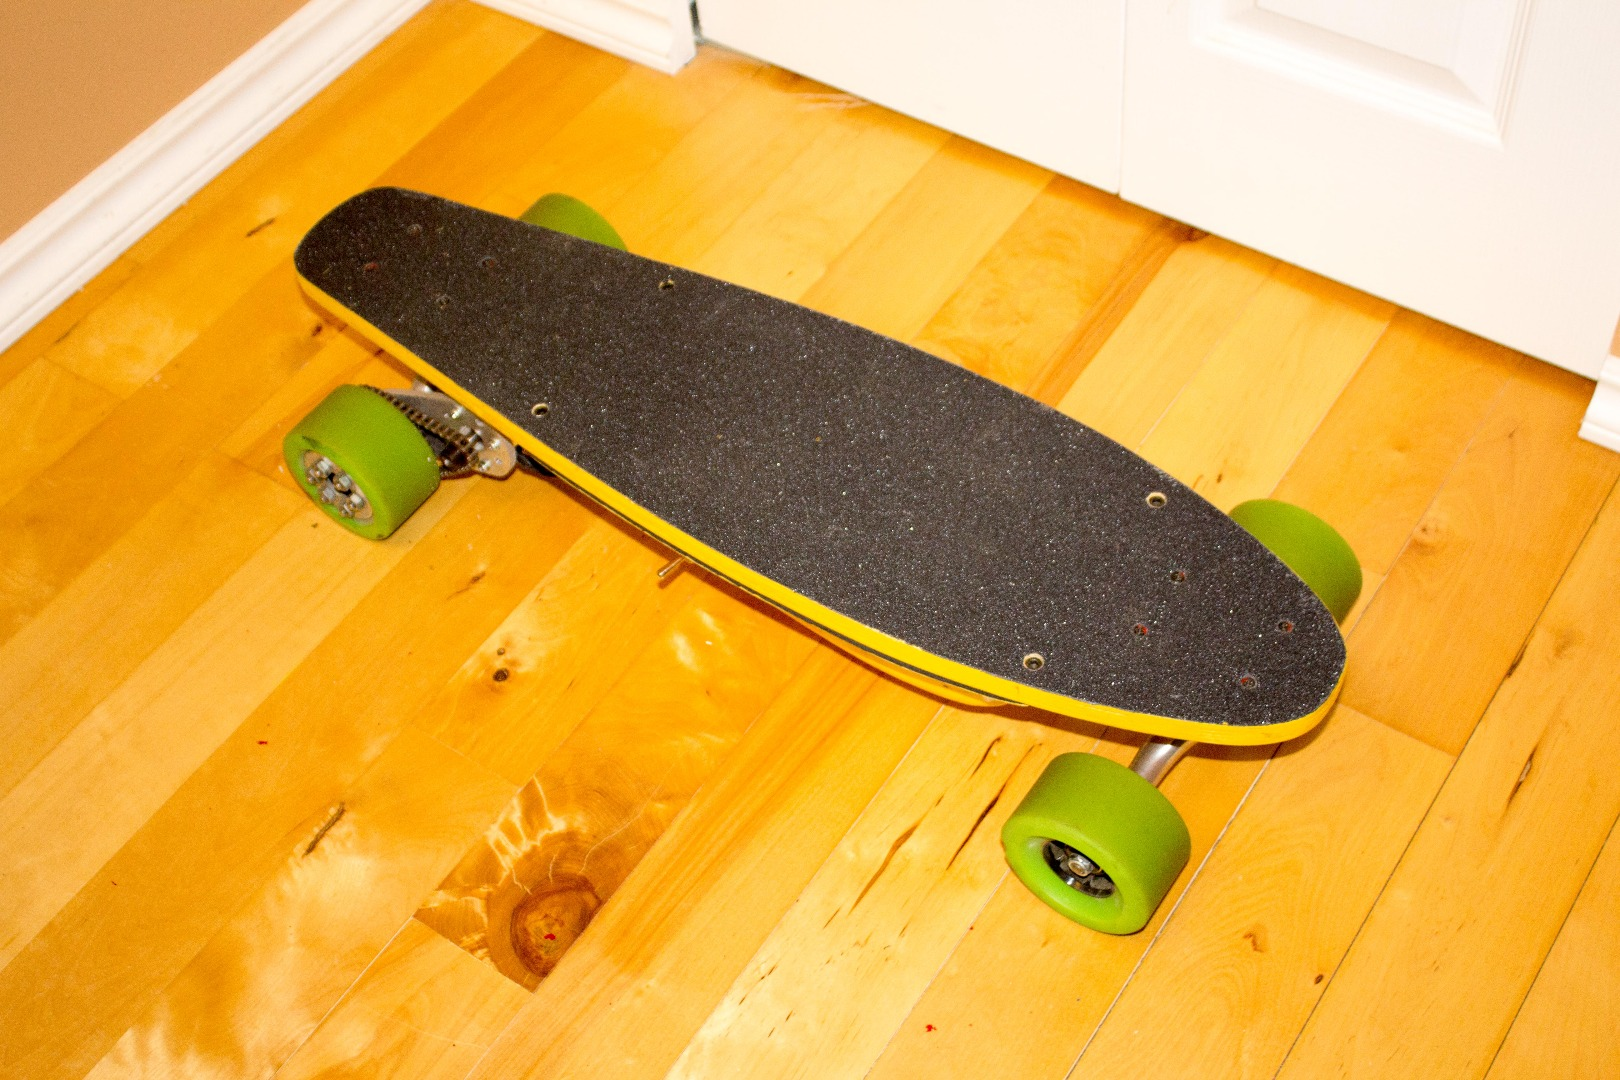 Picture of Electric Skateboard V4.0: the Banana Board